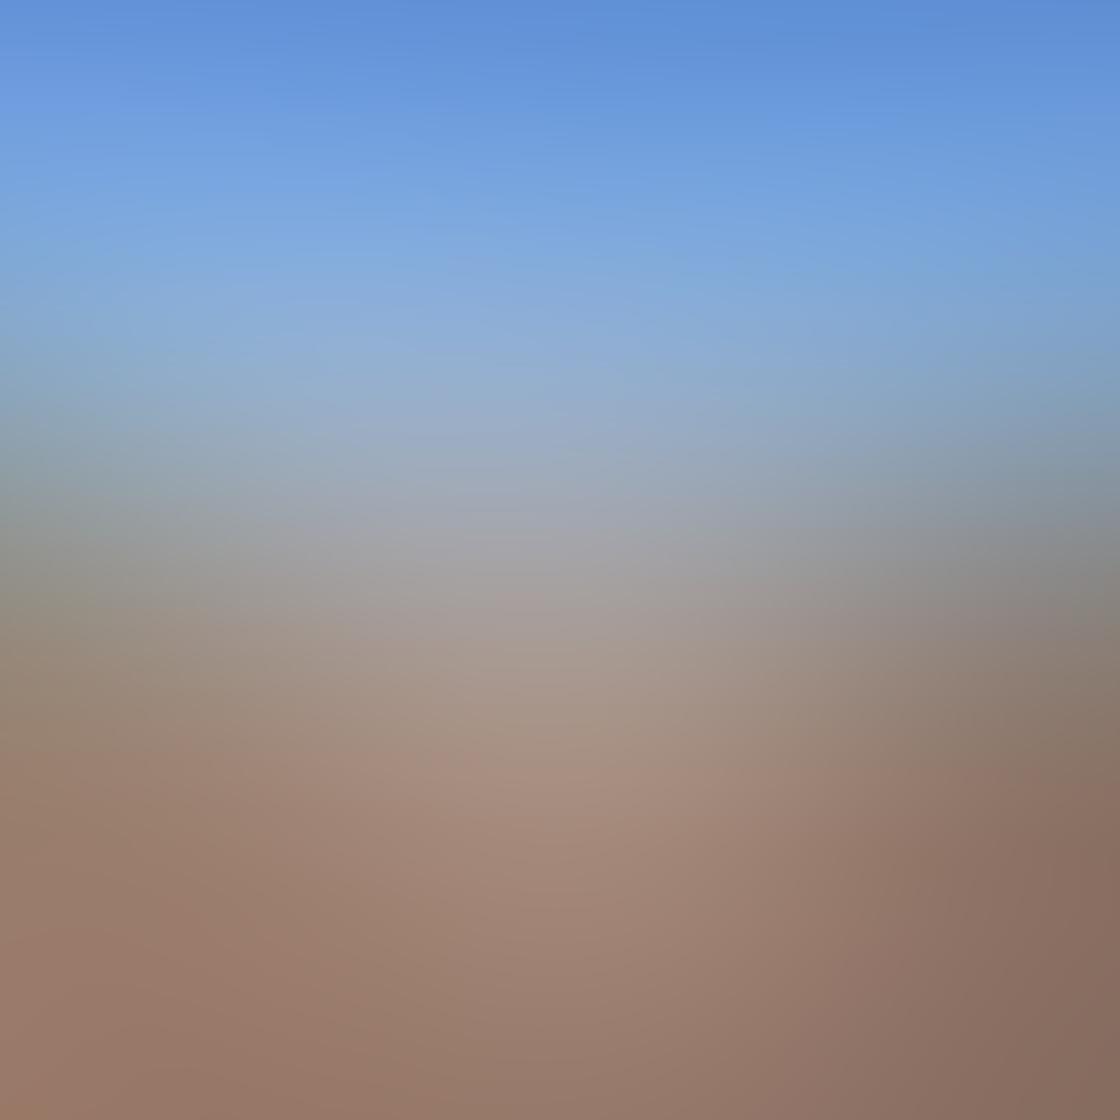 Minimalist Landscape iPhone Photos 9